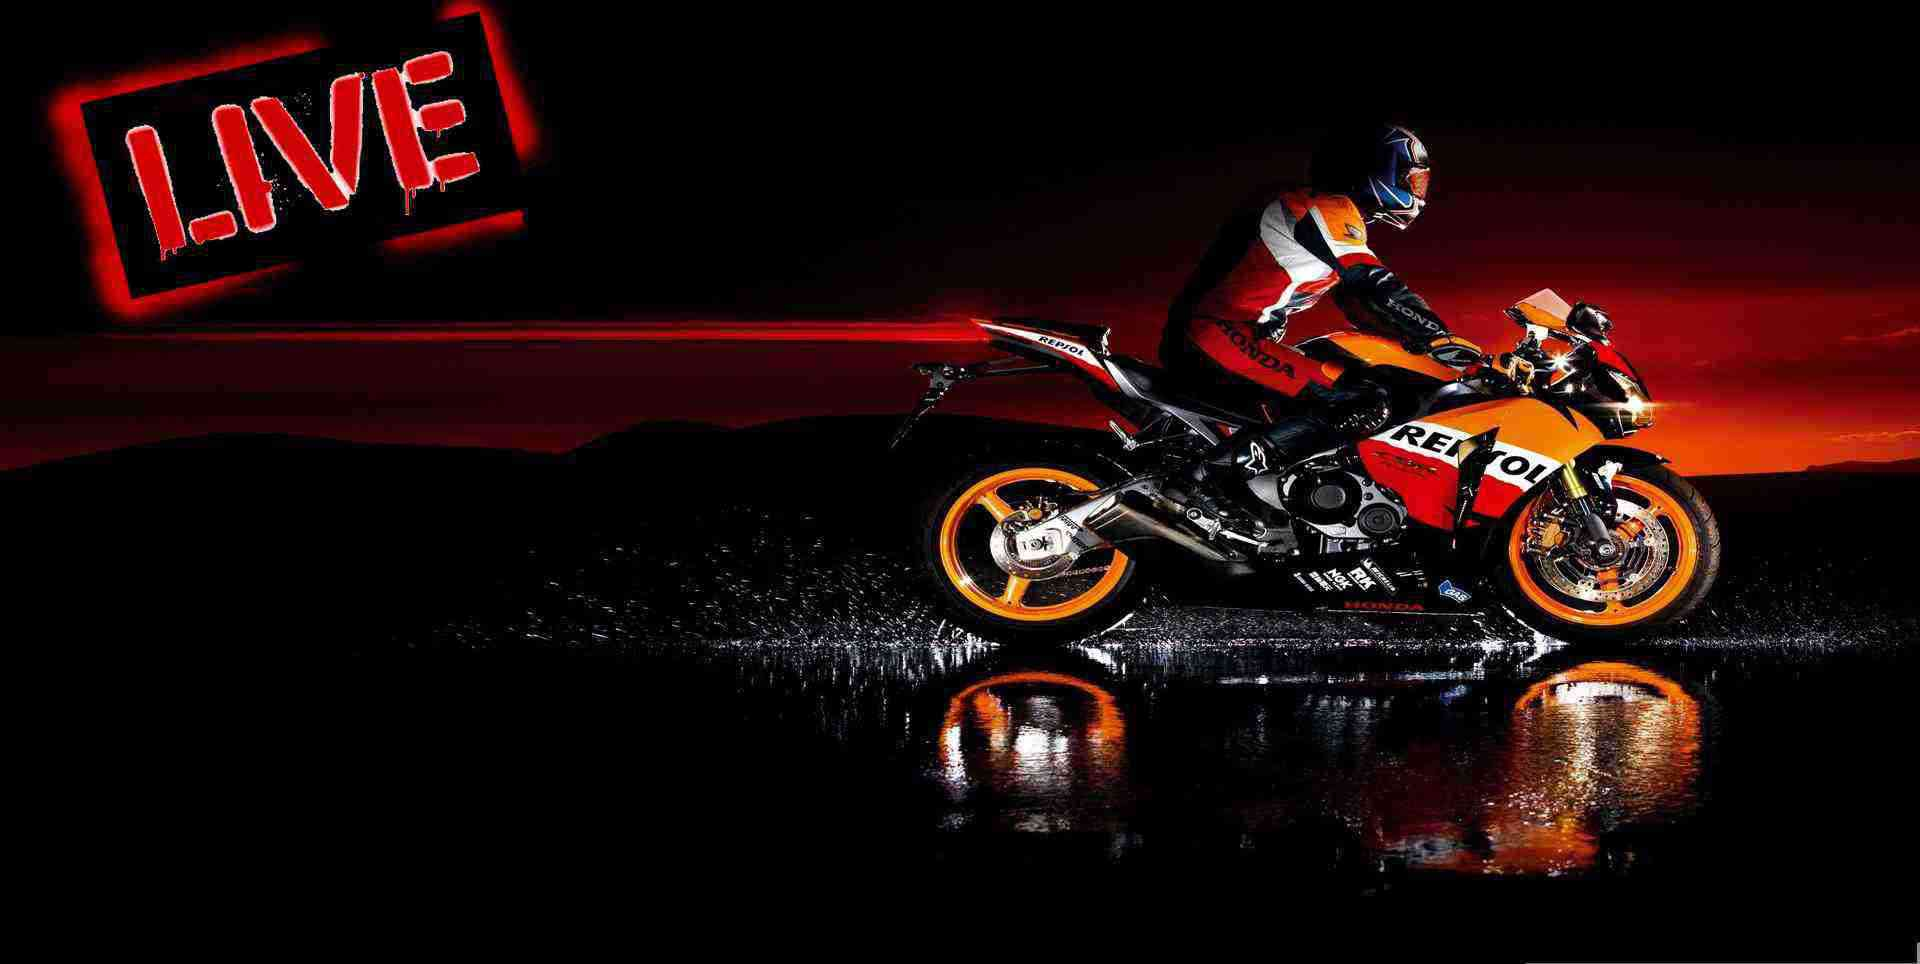 motogp-catalunya-grand-prix-2015-live-online